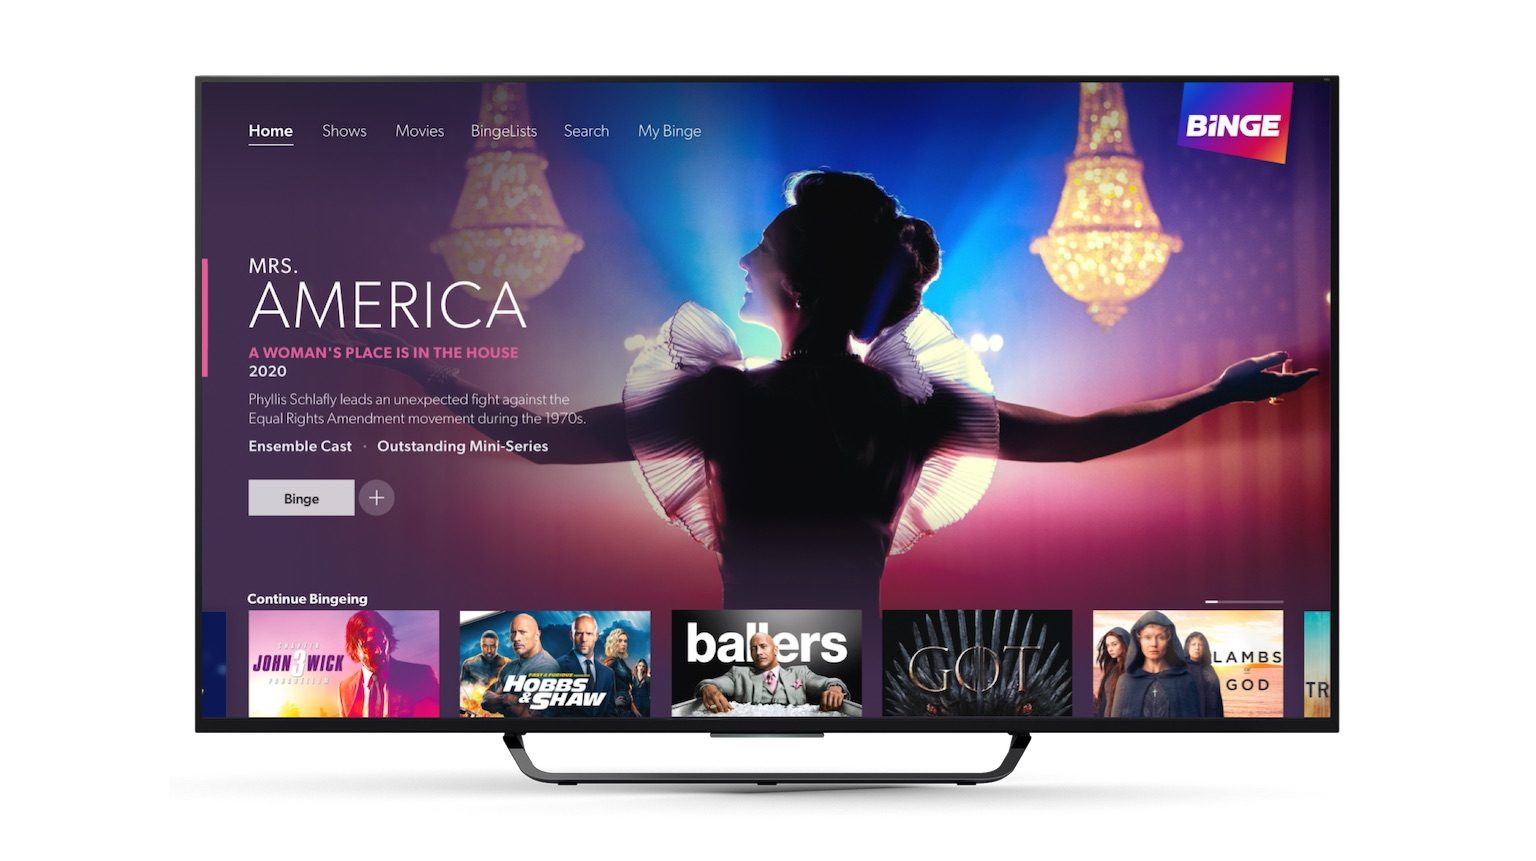 BInge interface on a TV